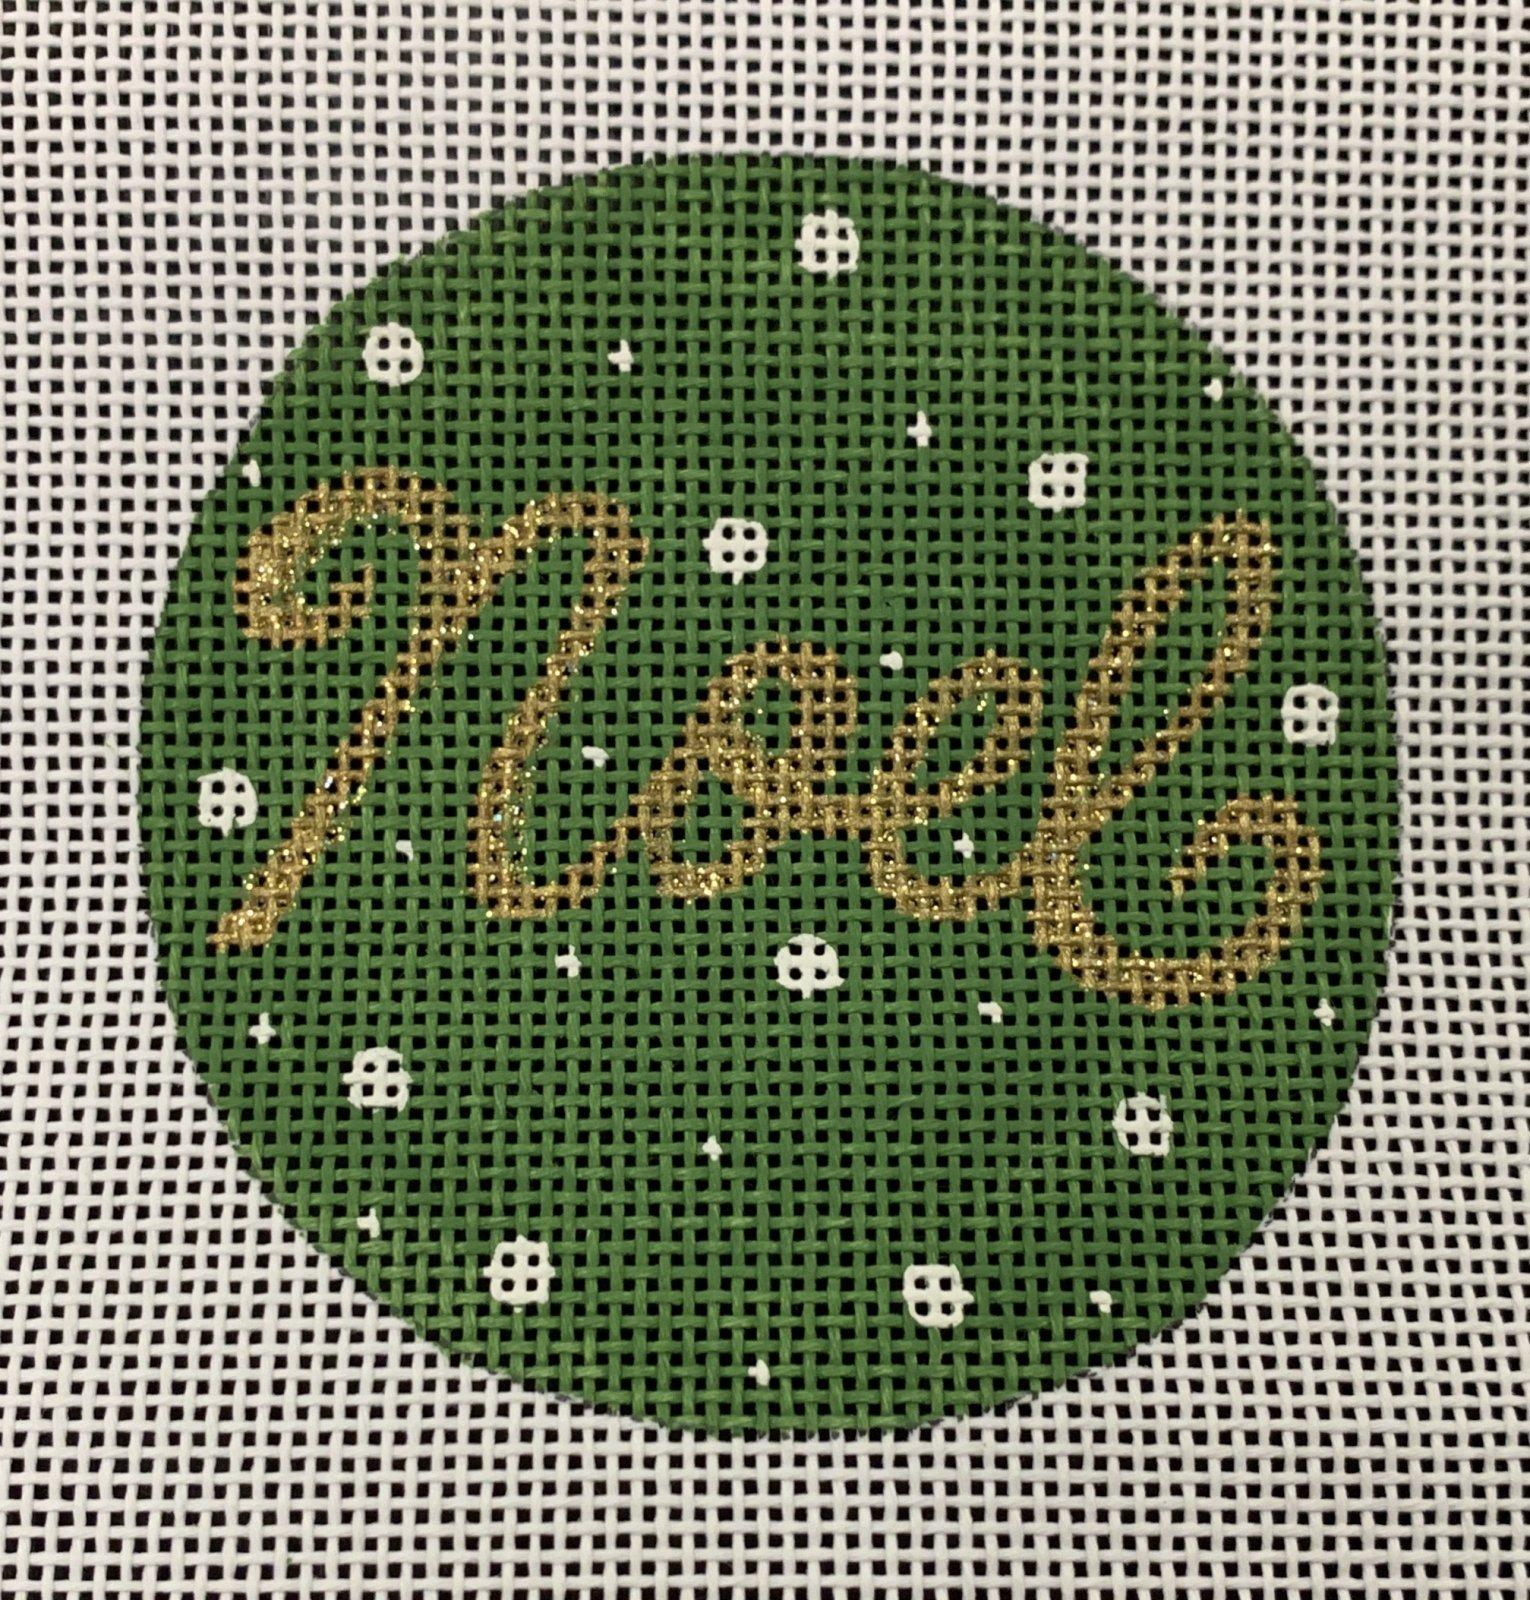 Noel on Green Ornament